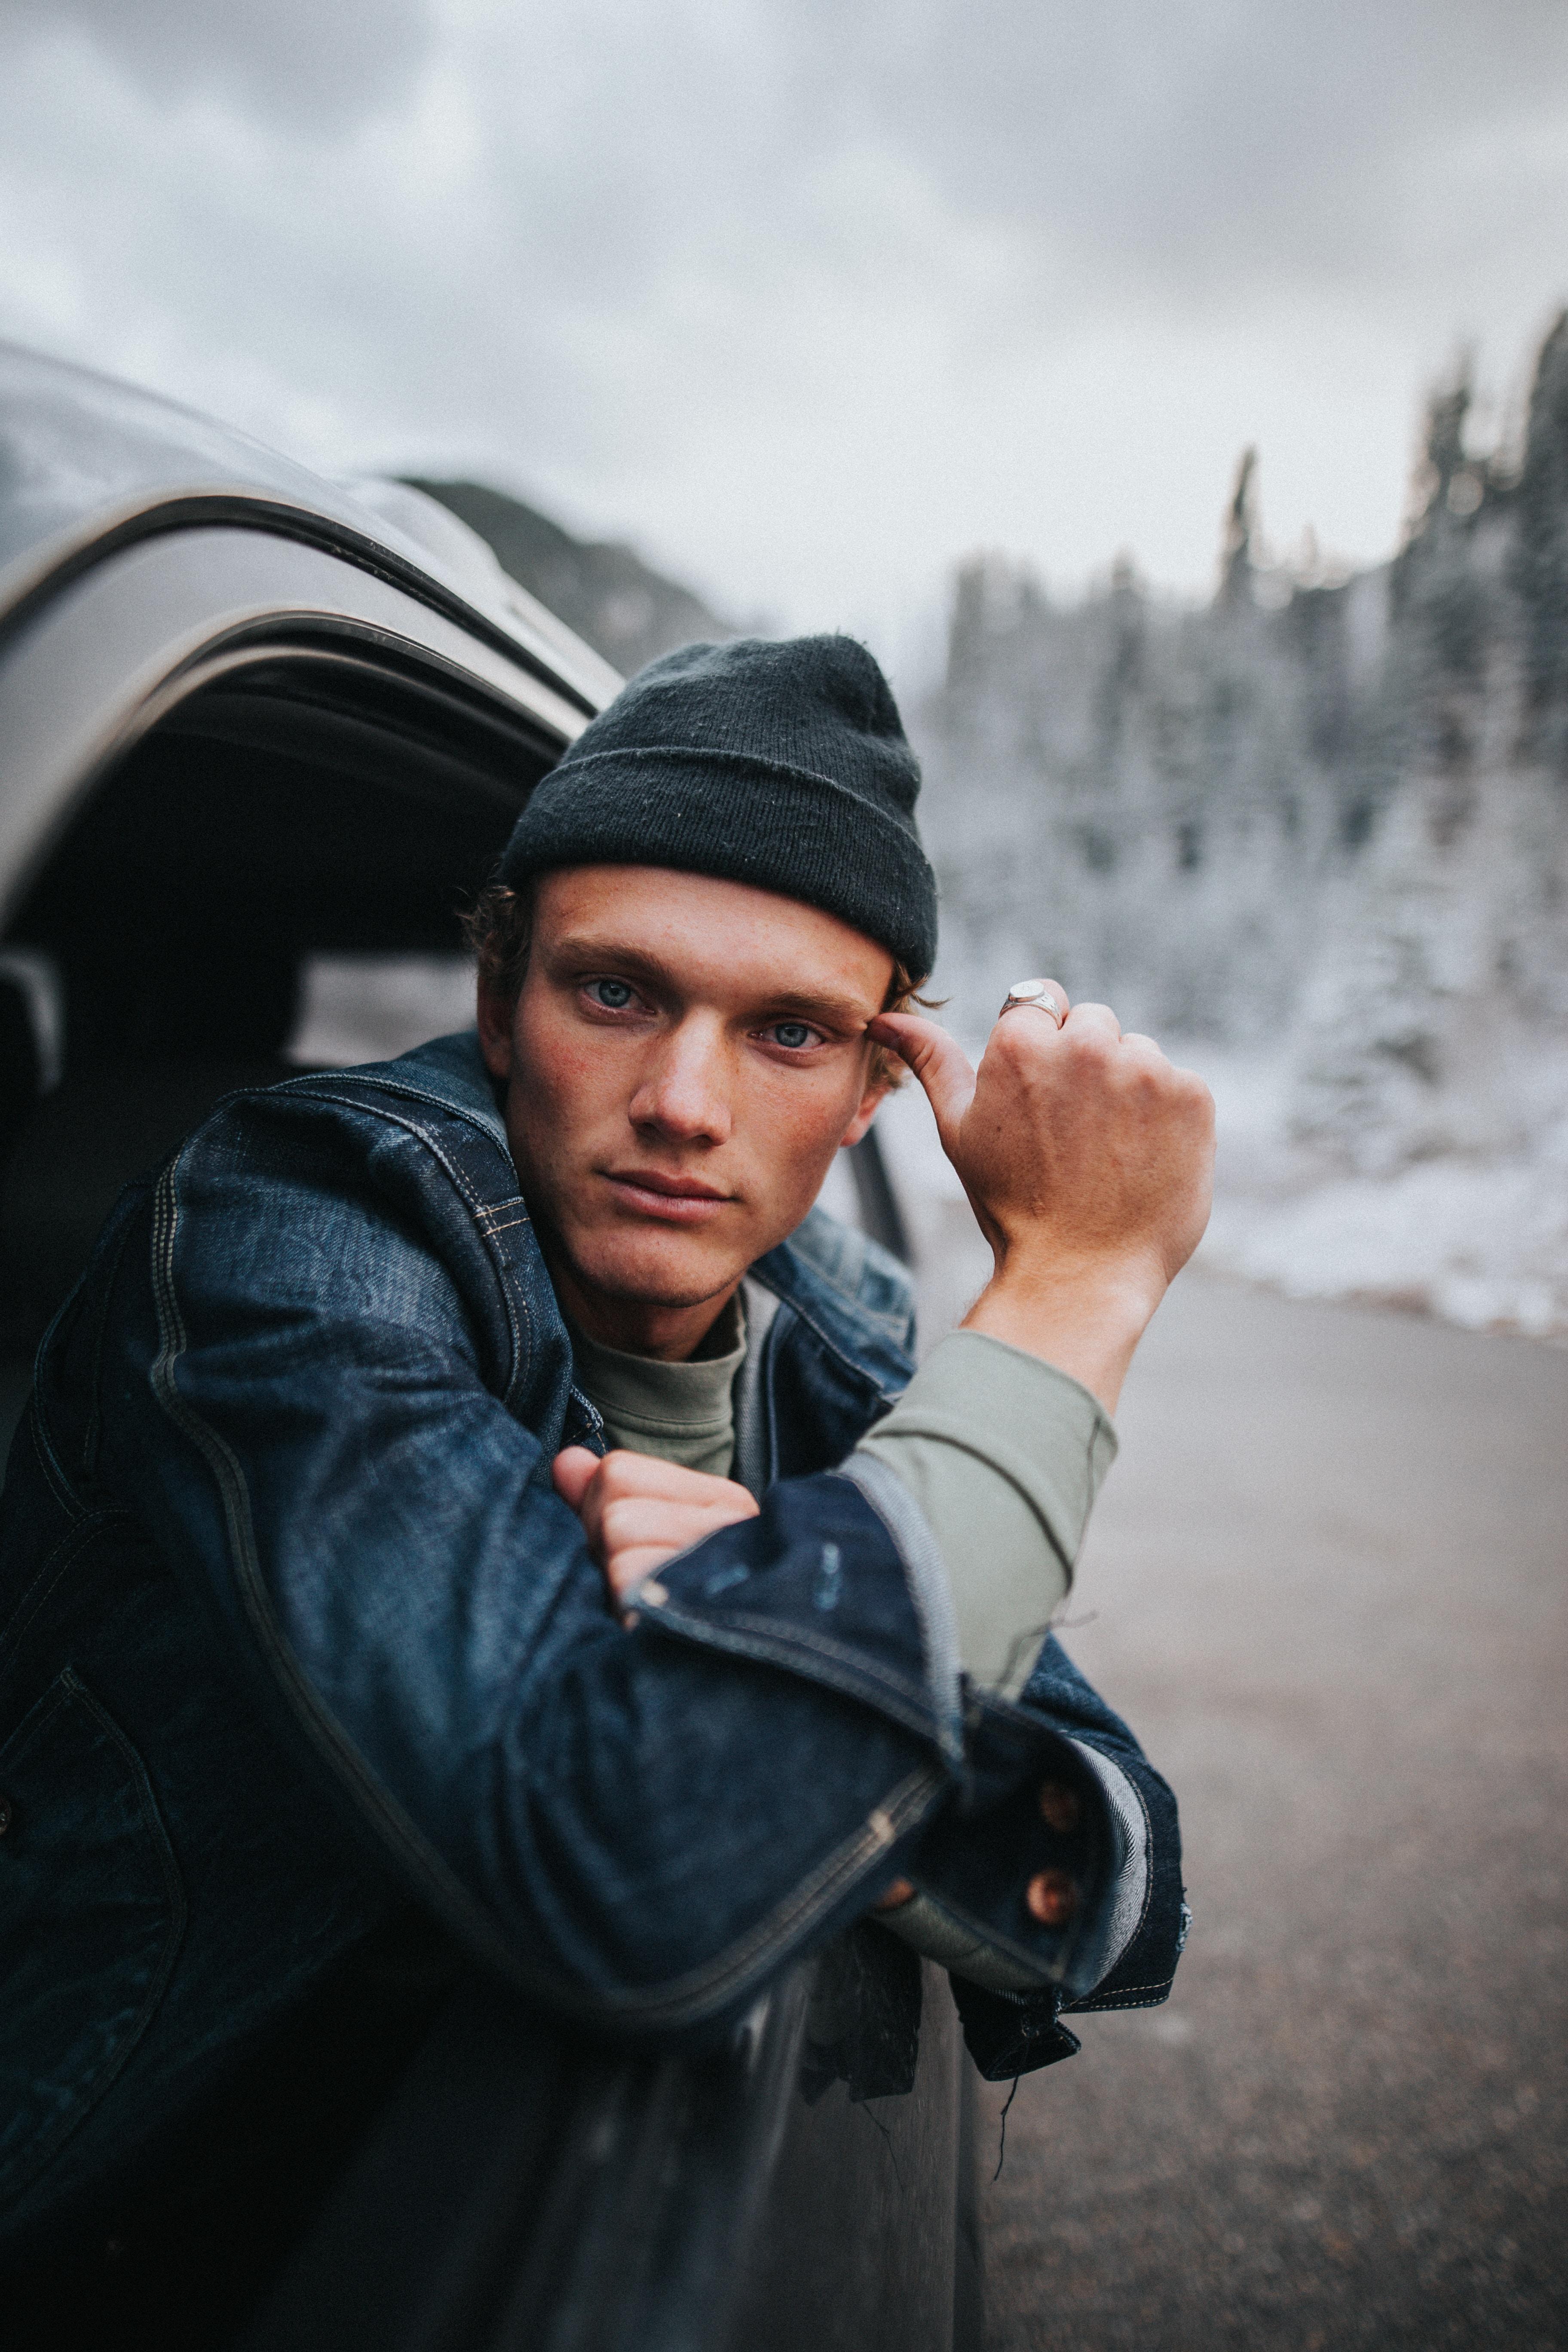 man sitting inside black vehicle